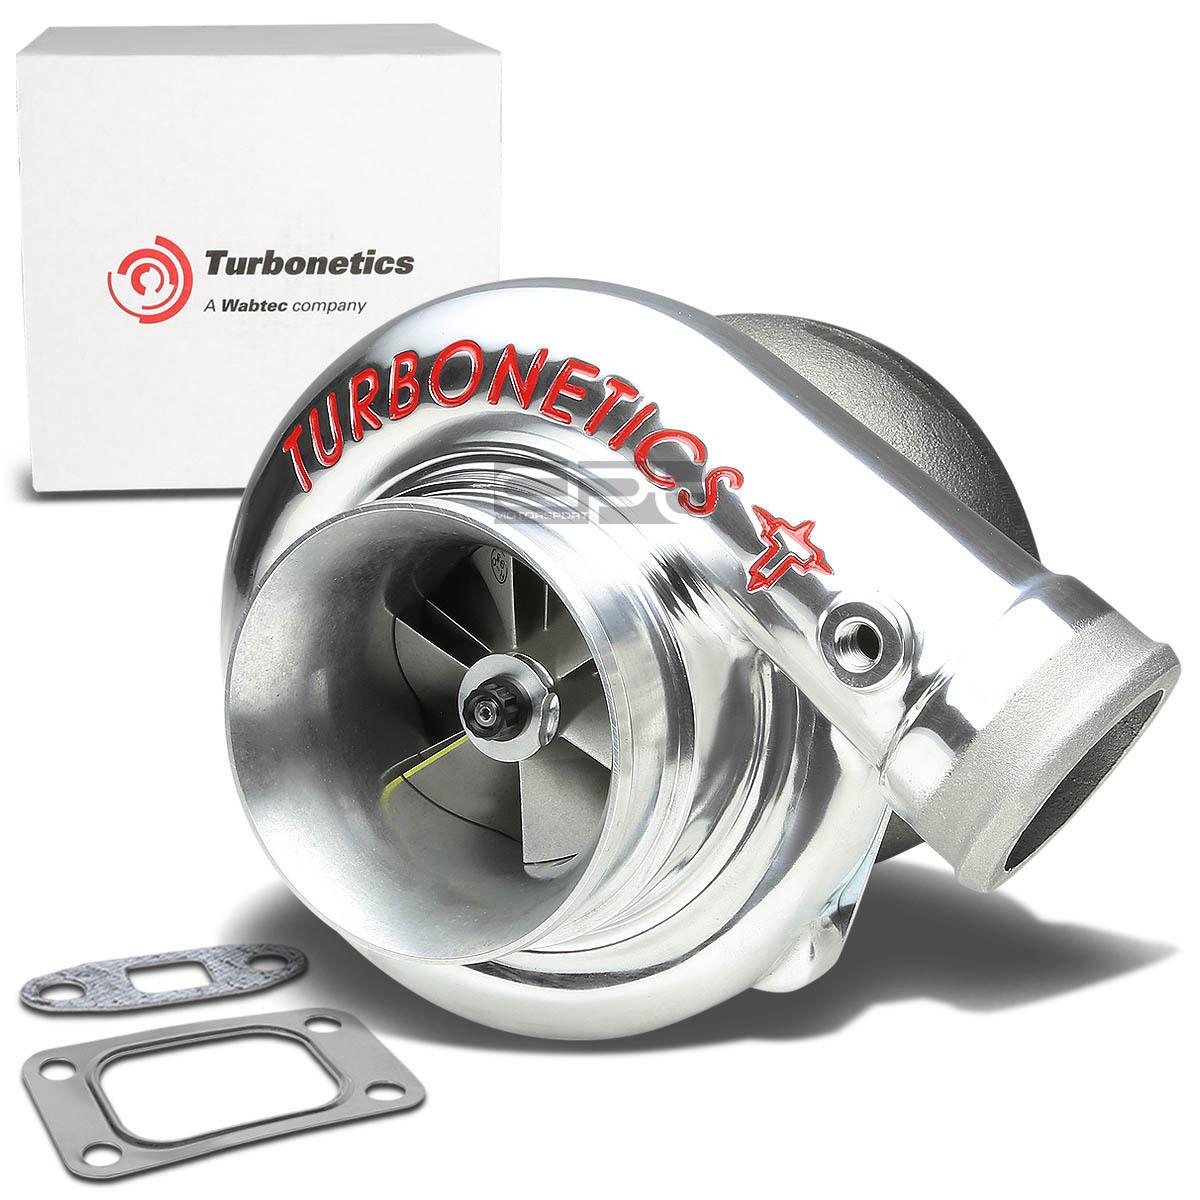 Turbonetics Turbo Chargers : Turbonetics turbocharger hurricane benita t